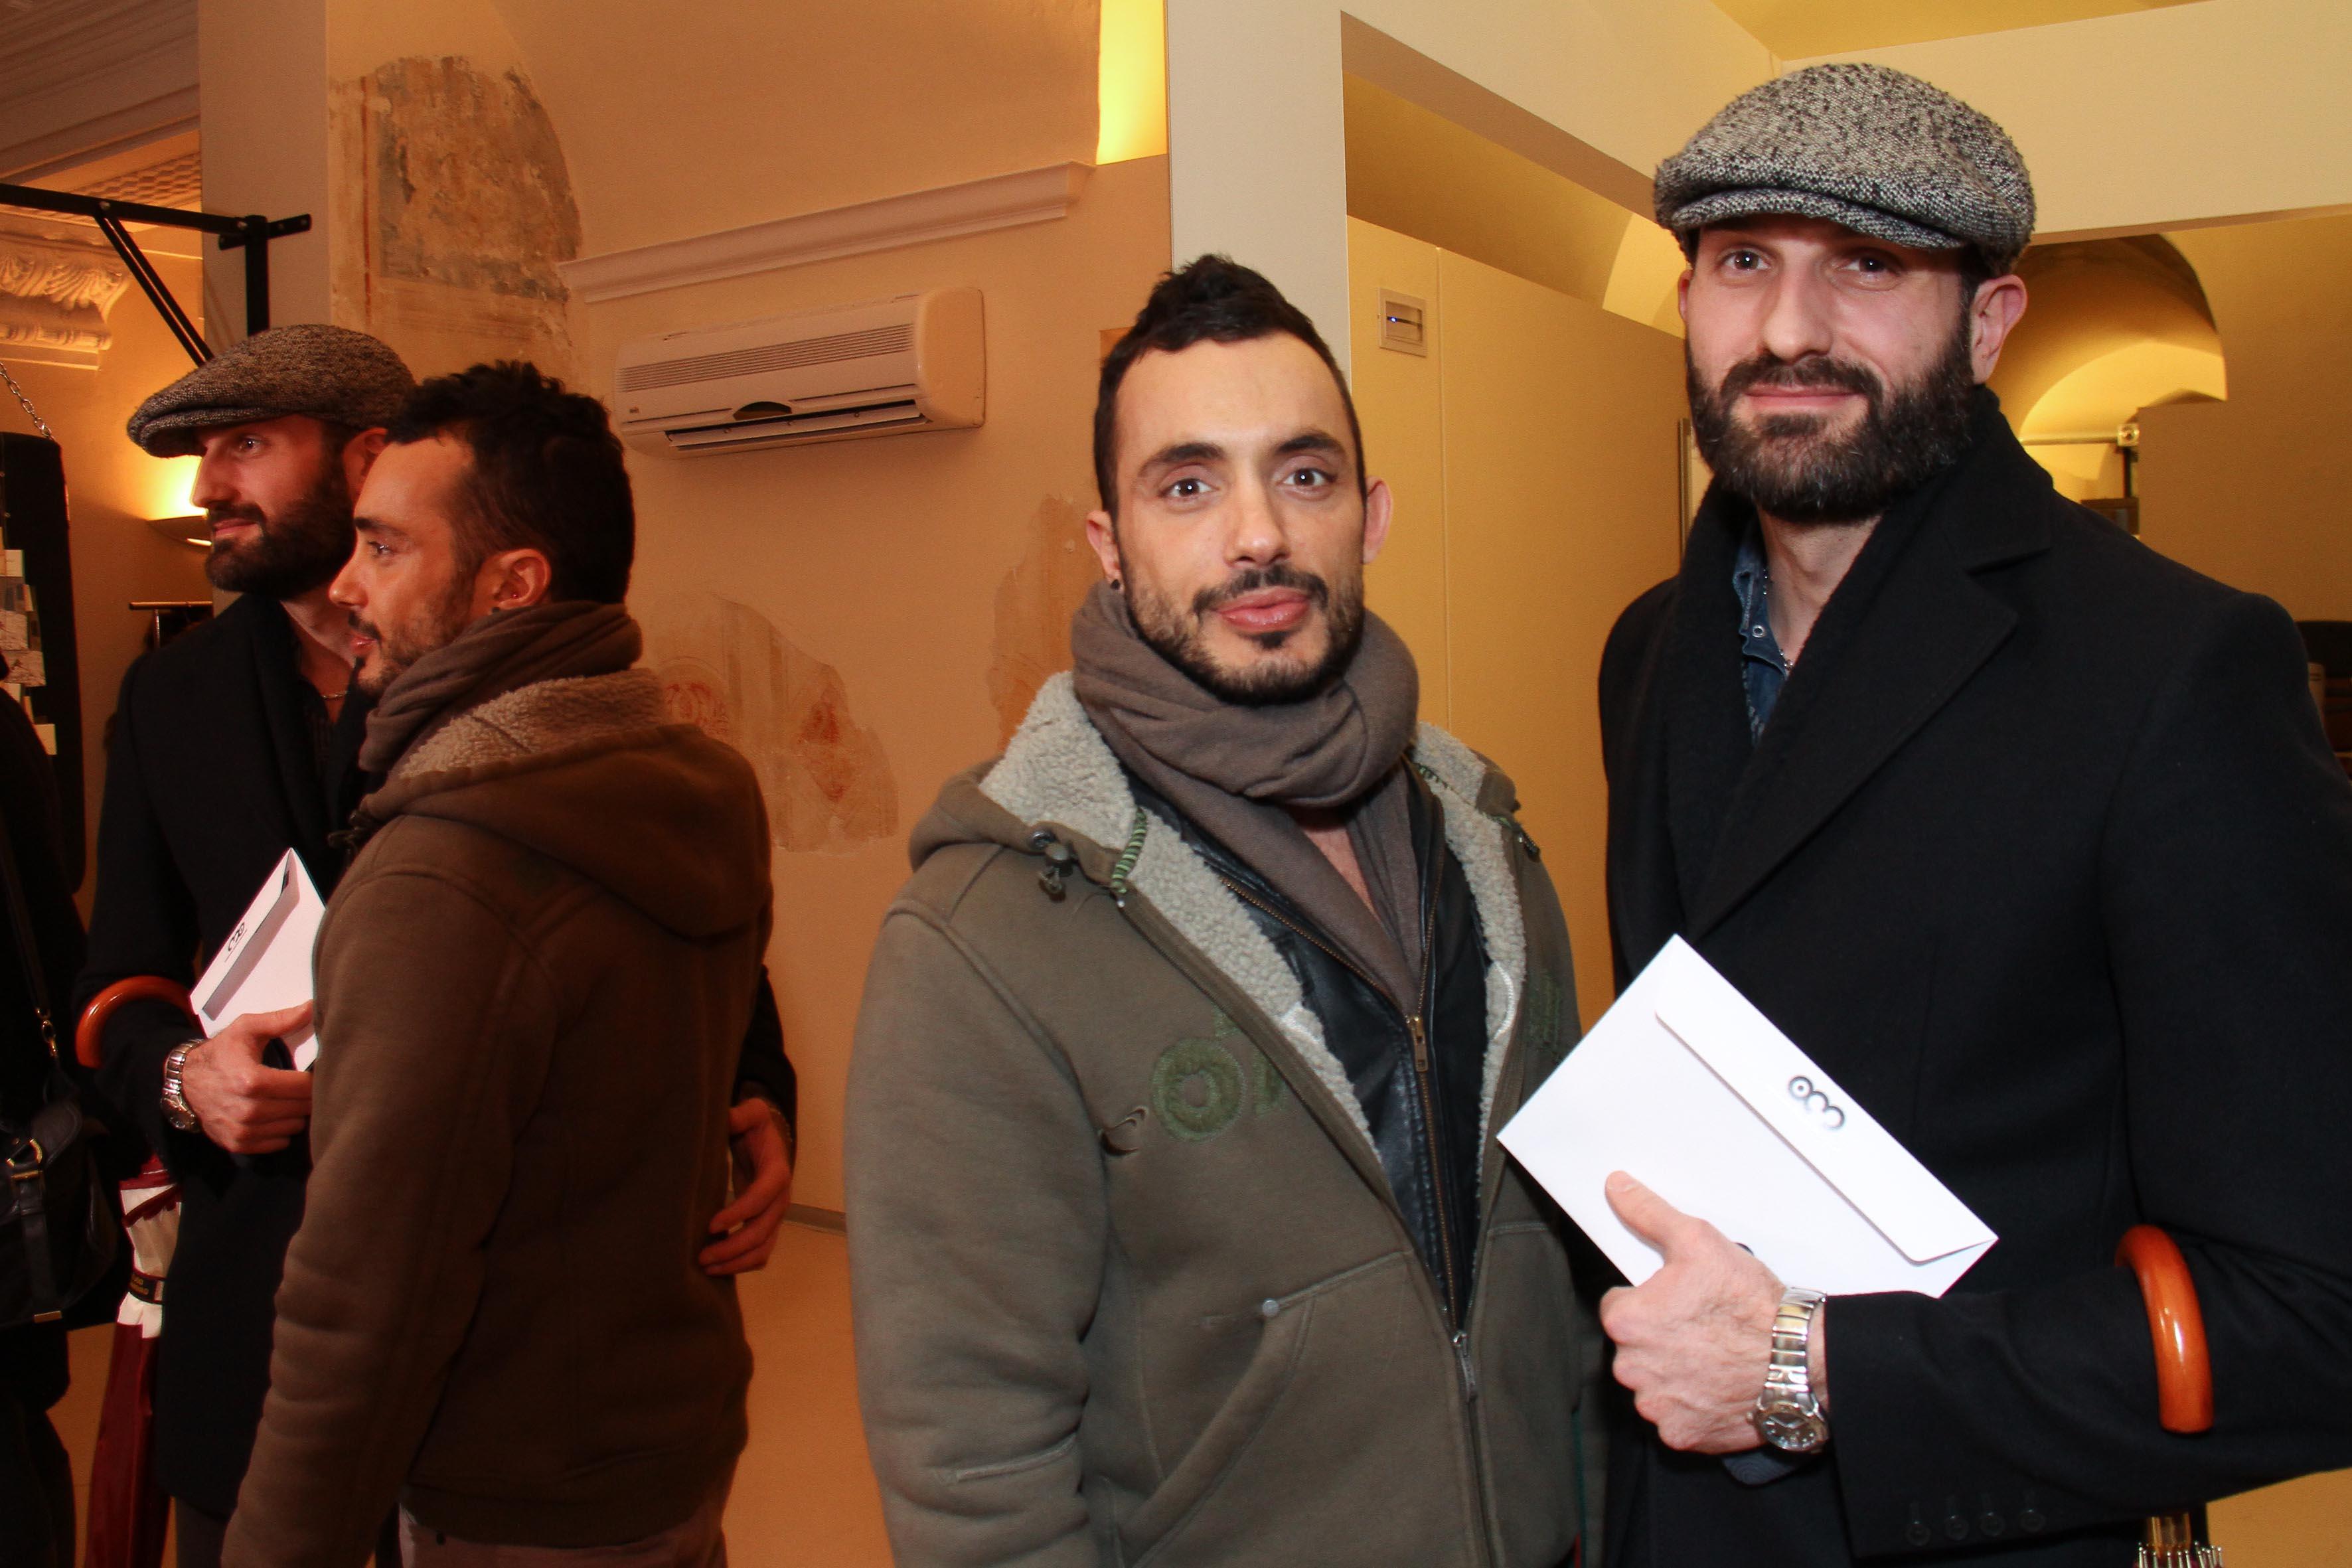 PRESSPHOTO Firenze, palestra OM. Nella foto Angelo Nenna e Michelangelo D'Elia